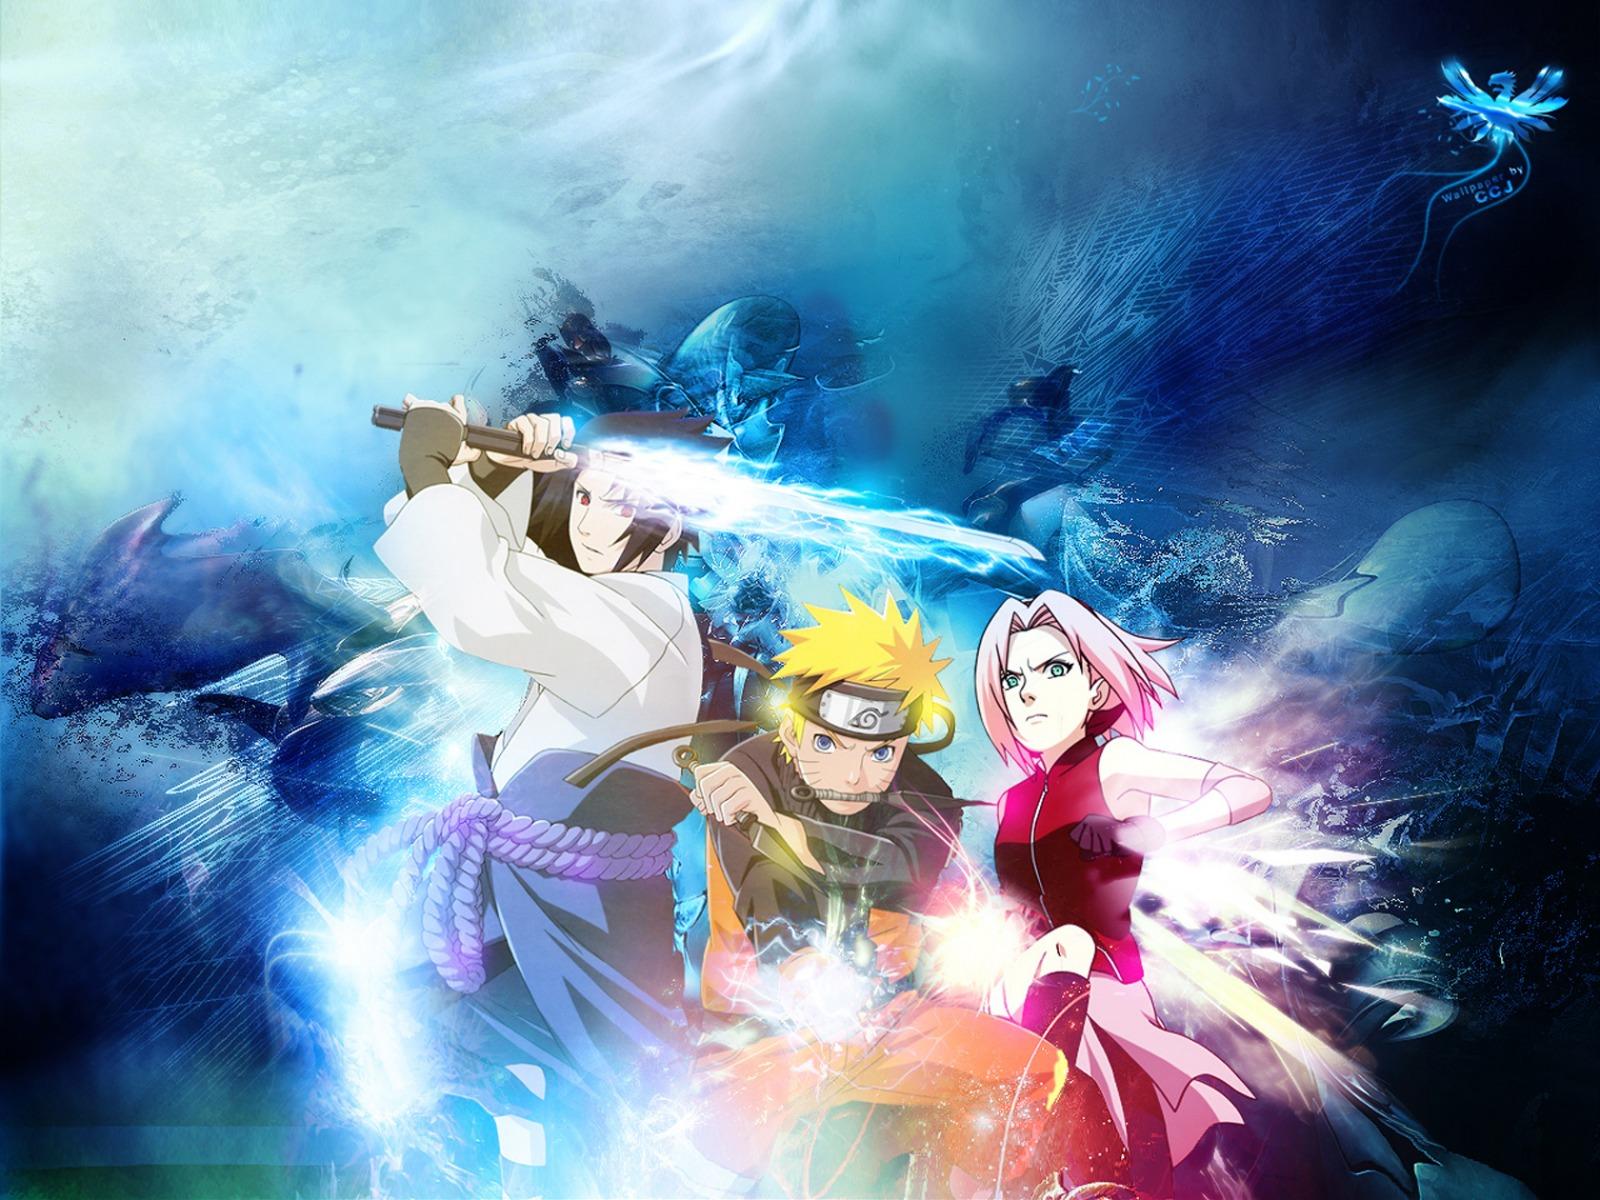 50 ] Naruto HD Wallpapers For Desktop On WallpaperSafari